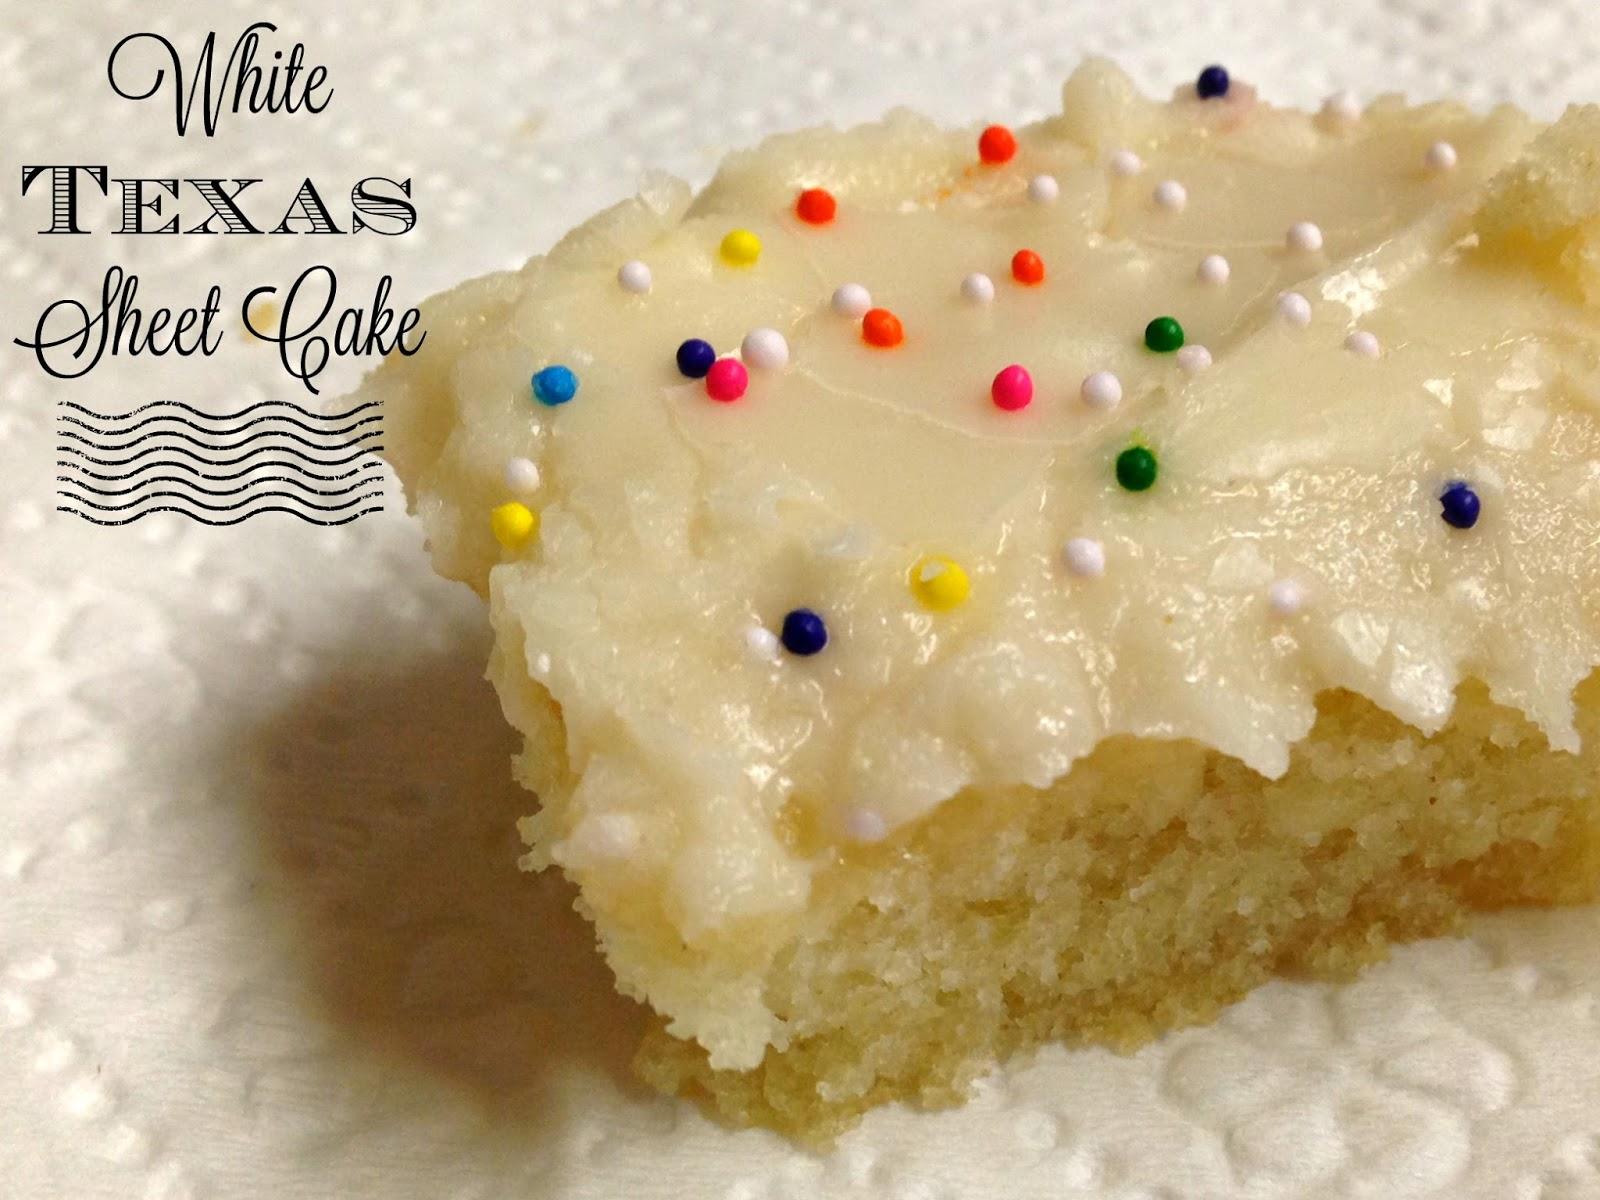 The Rehomesteaders White Texas Sheet Cake